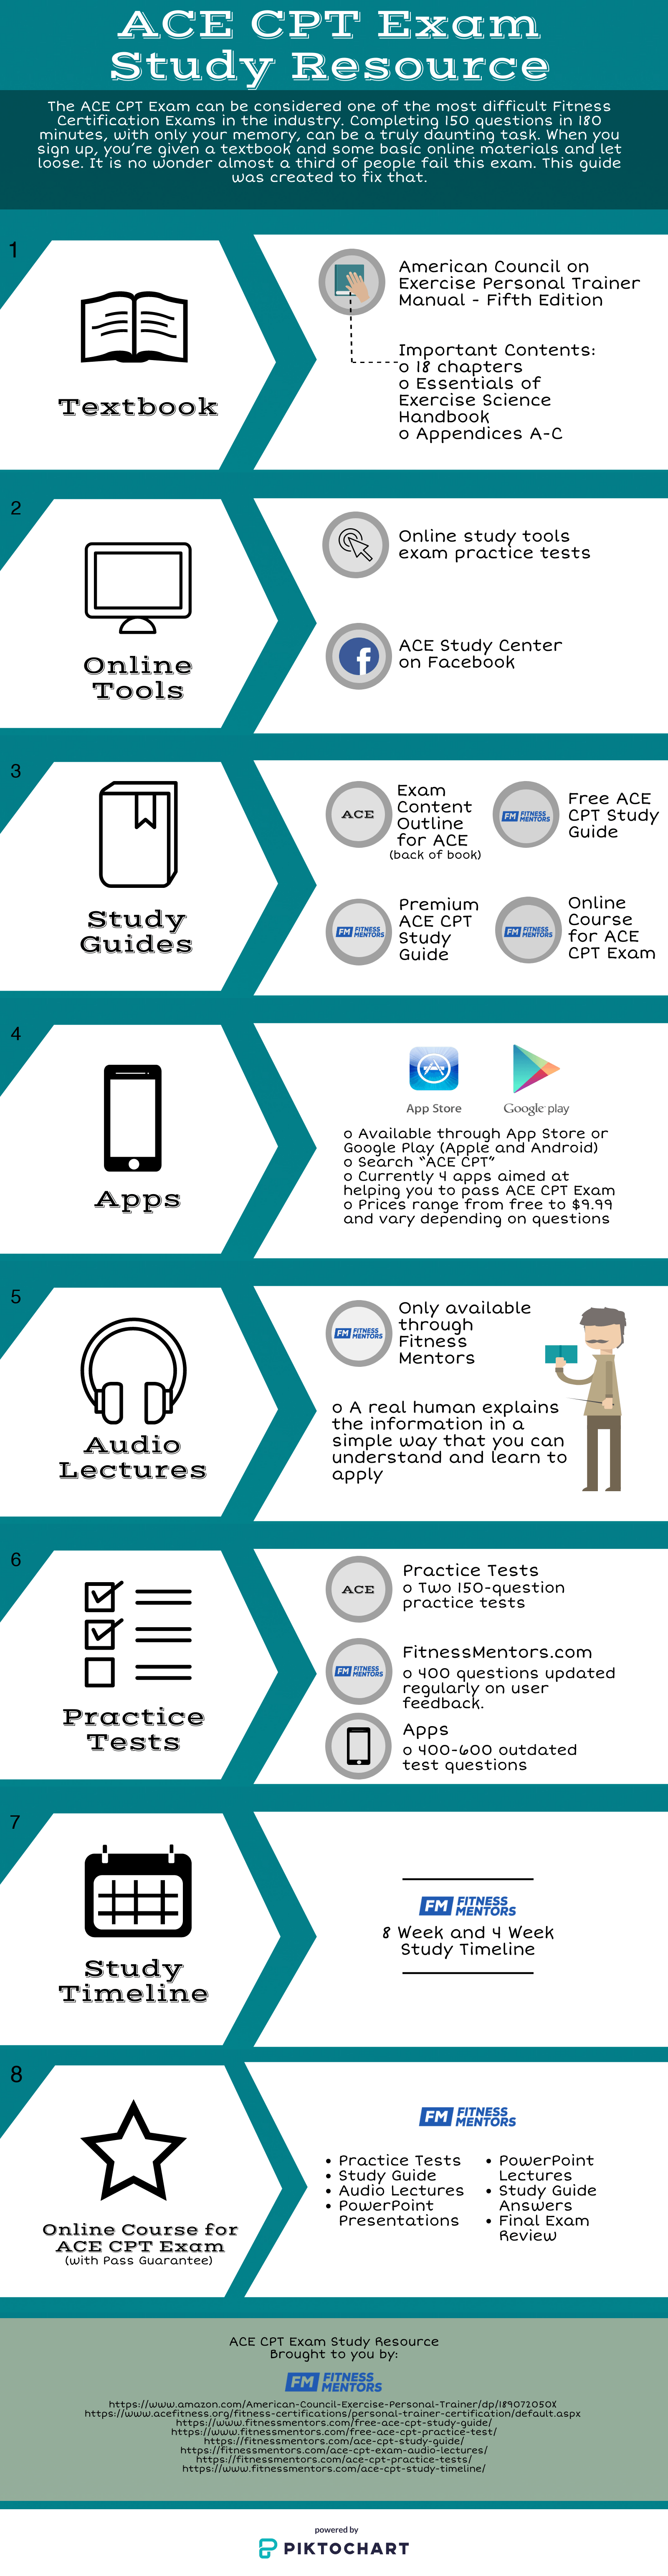 ACE CPT Exam Study Guide